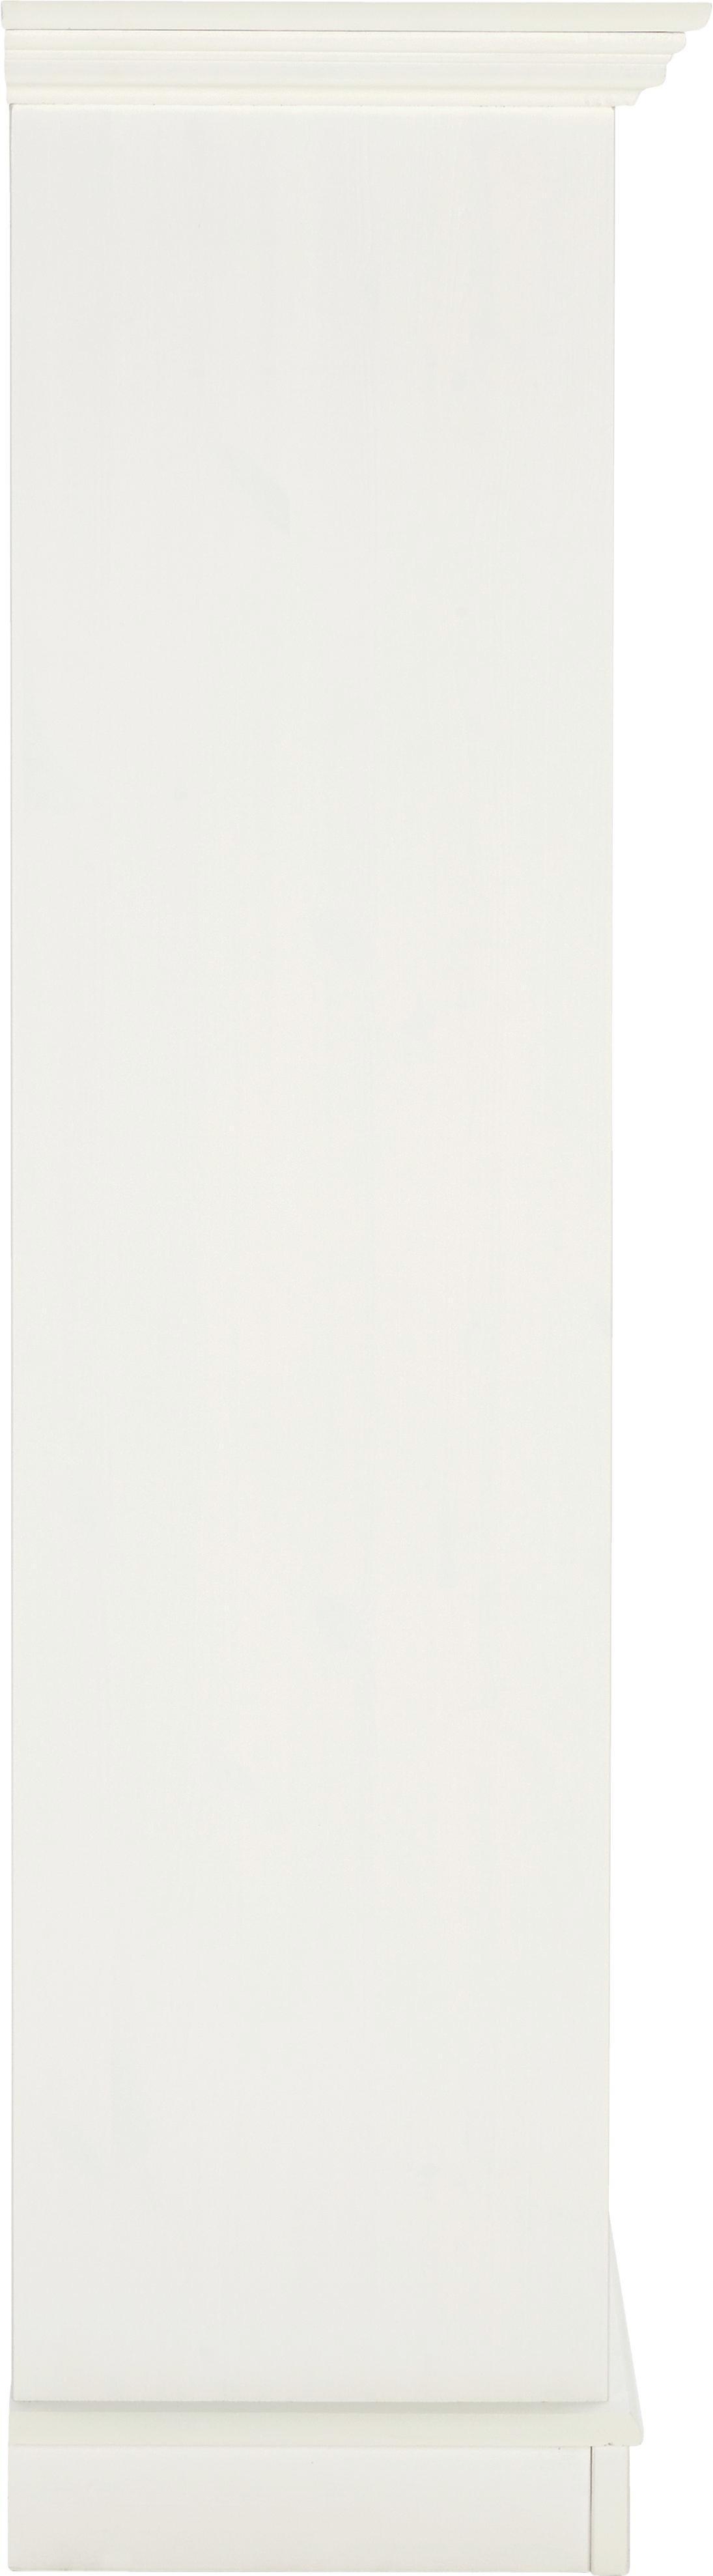 Schuhschrank Claudia - Weiß, Holz/Metall (80/135/35cm) - PREMIUM LIVING